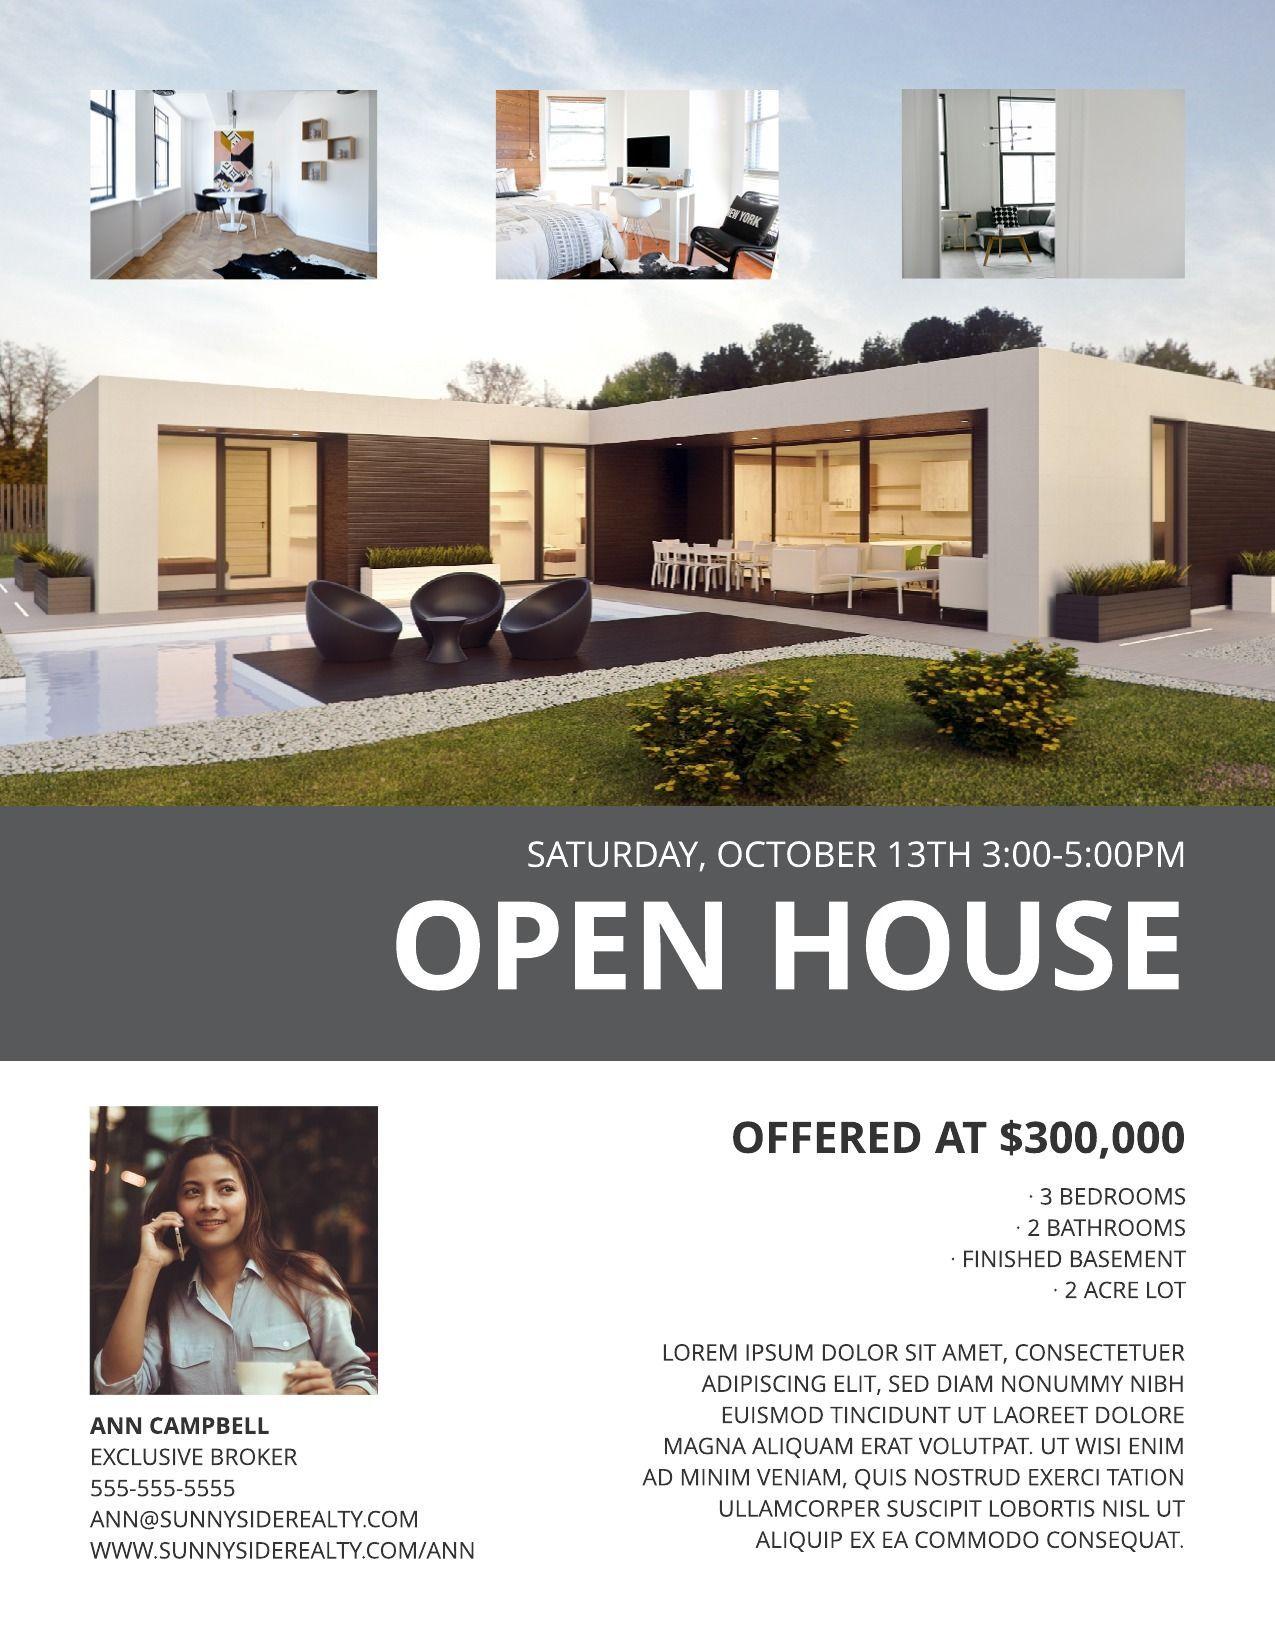 003 Best Open House Flyer Template Design  Templates Word Free School MicrosoftFull